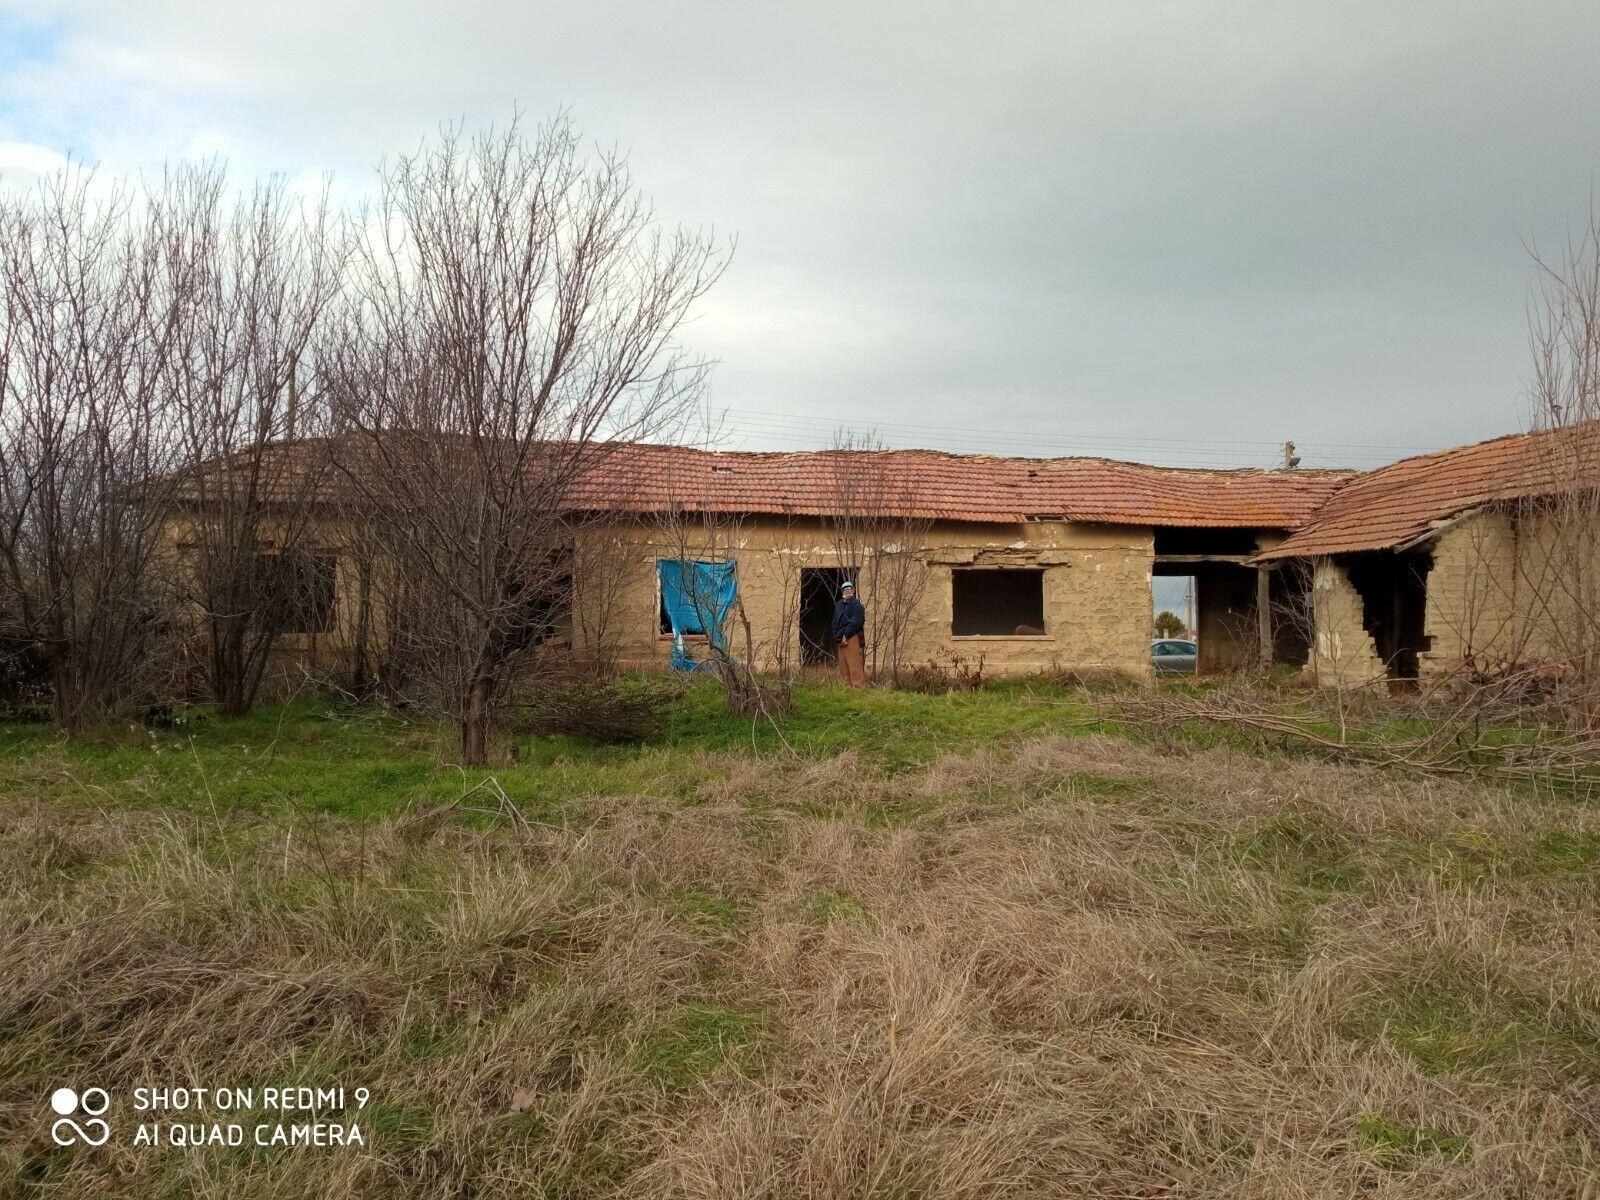 Bulgaria Bulgarian Ovcha mogila village Svishtov, VT 2600 Sqm Lower Start Price